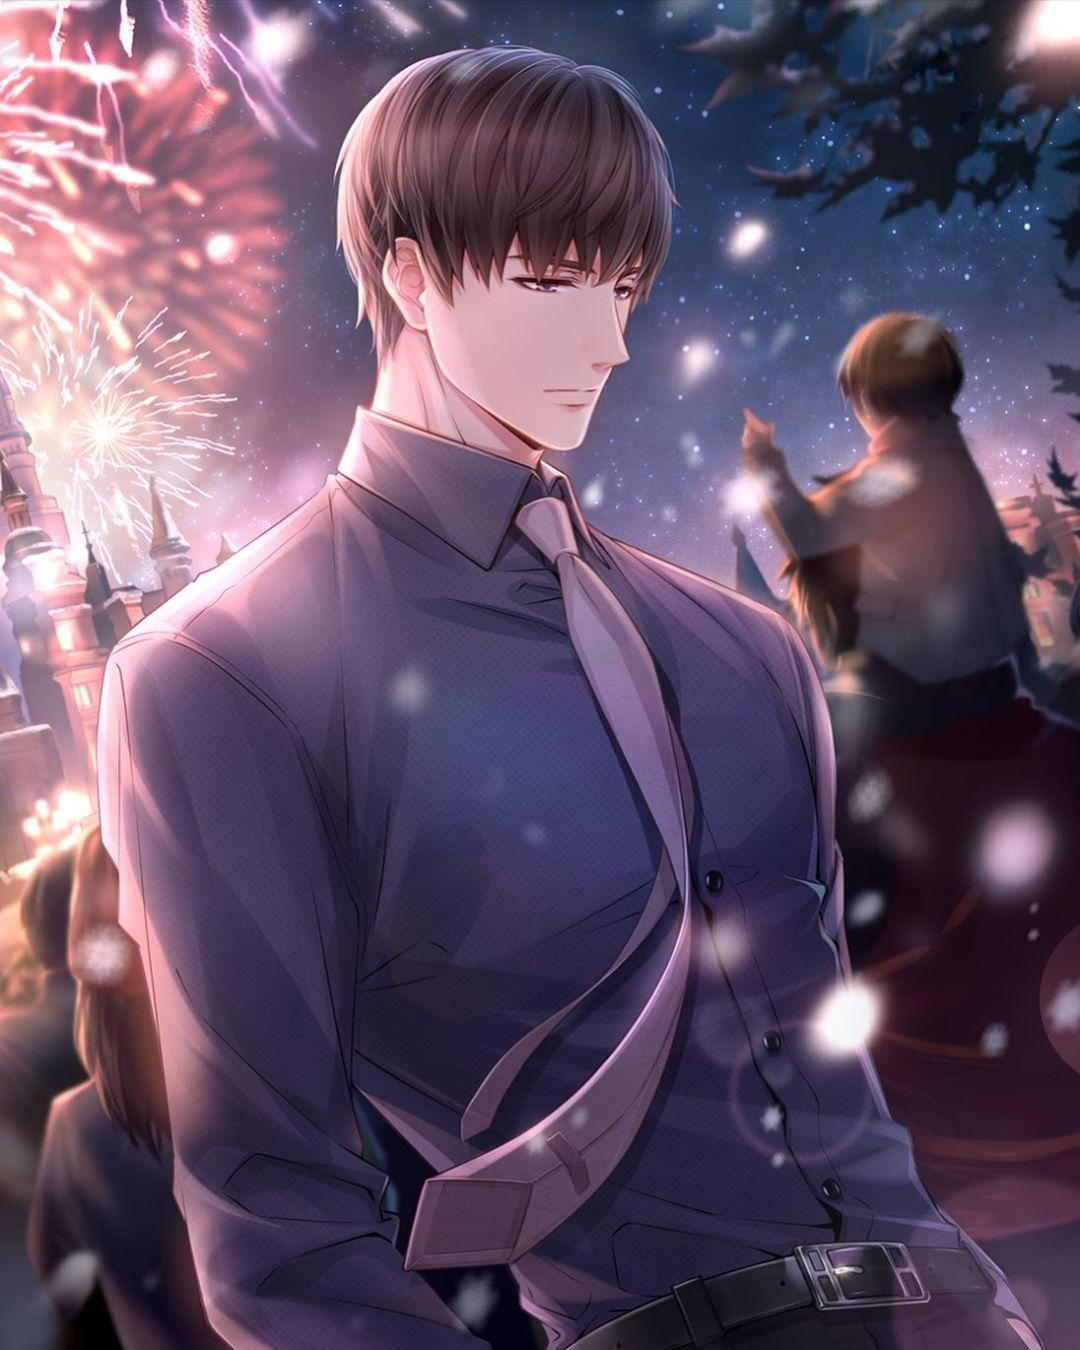 Pin Oleh Nisnasty Di Mr Love Dream Date Di 2020 Orang Animasi Gambar Anime Animasi